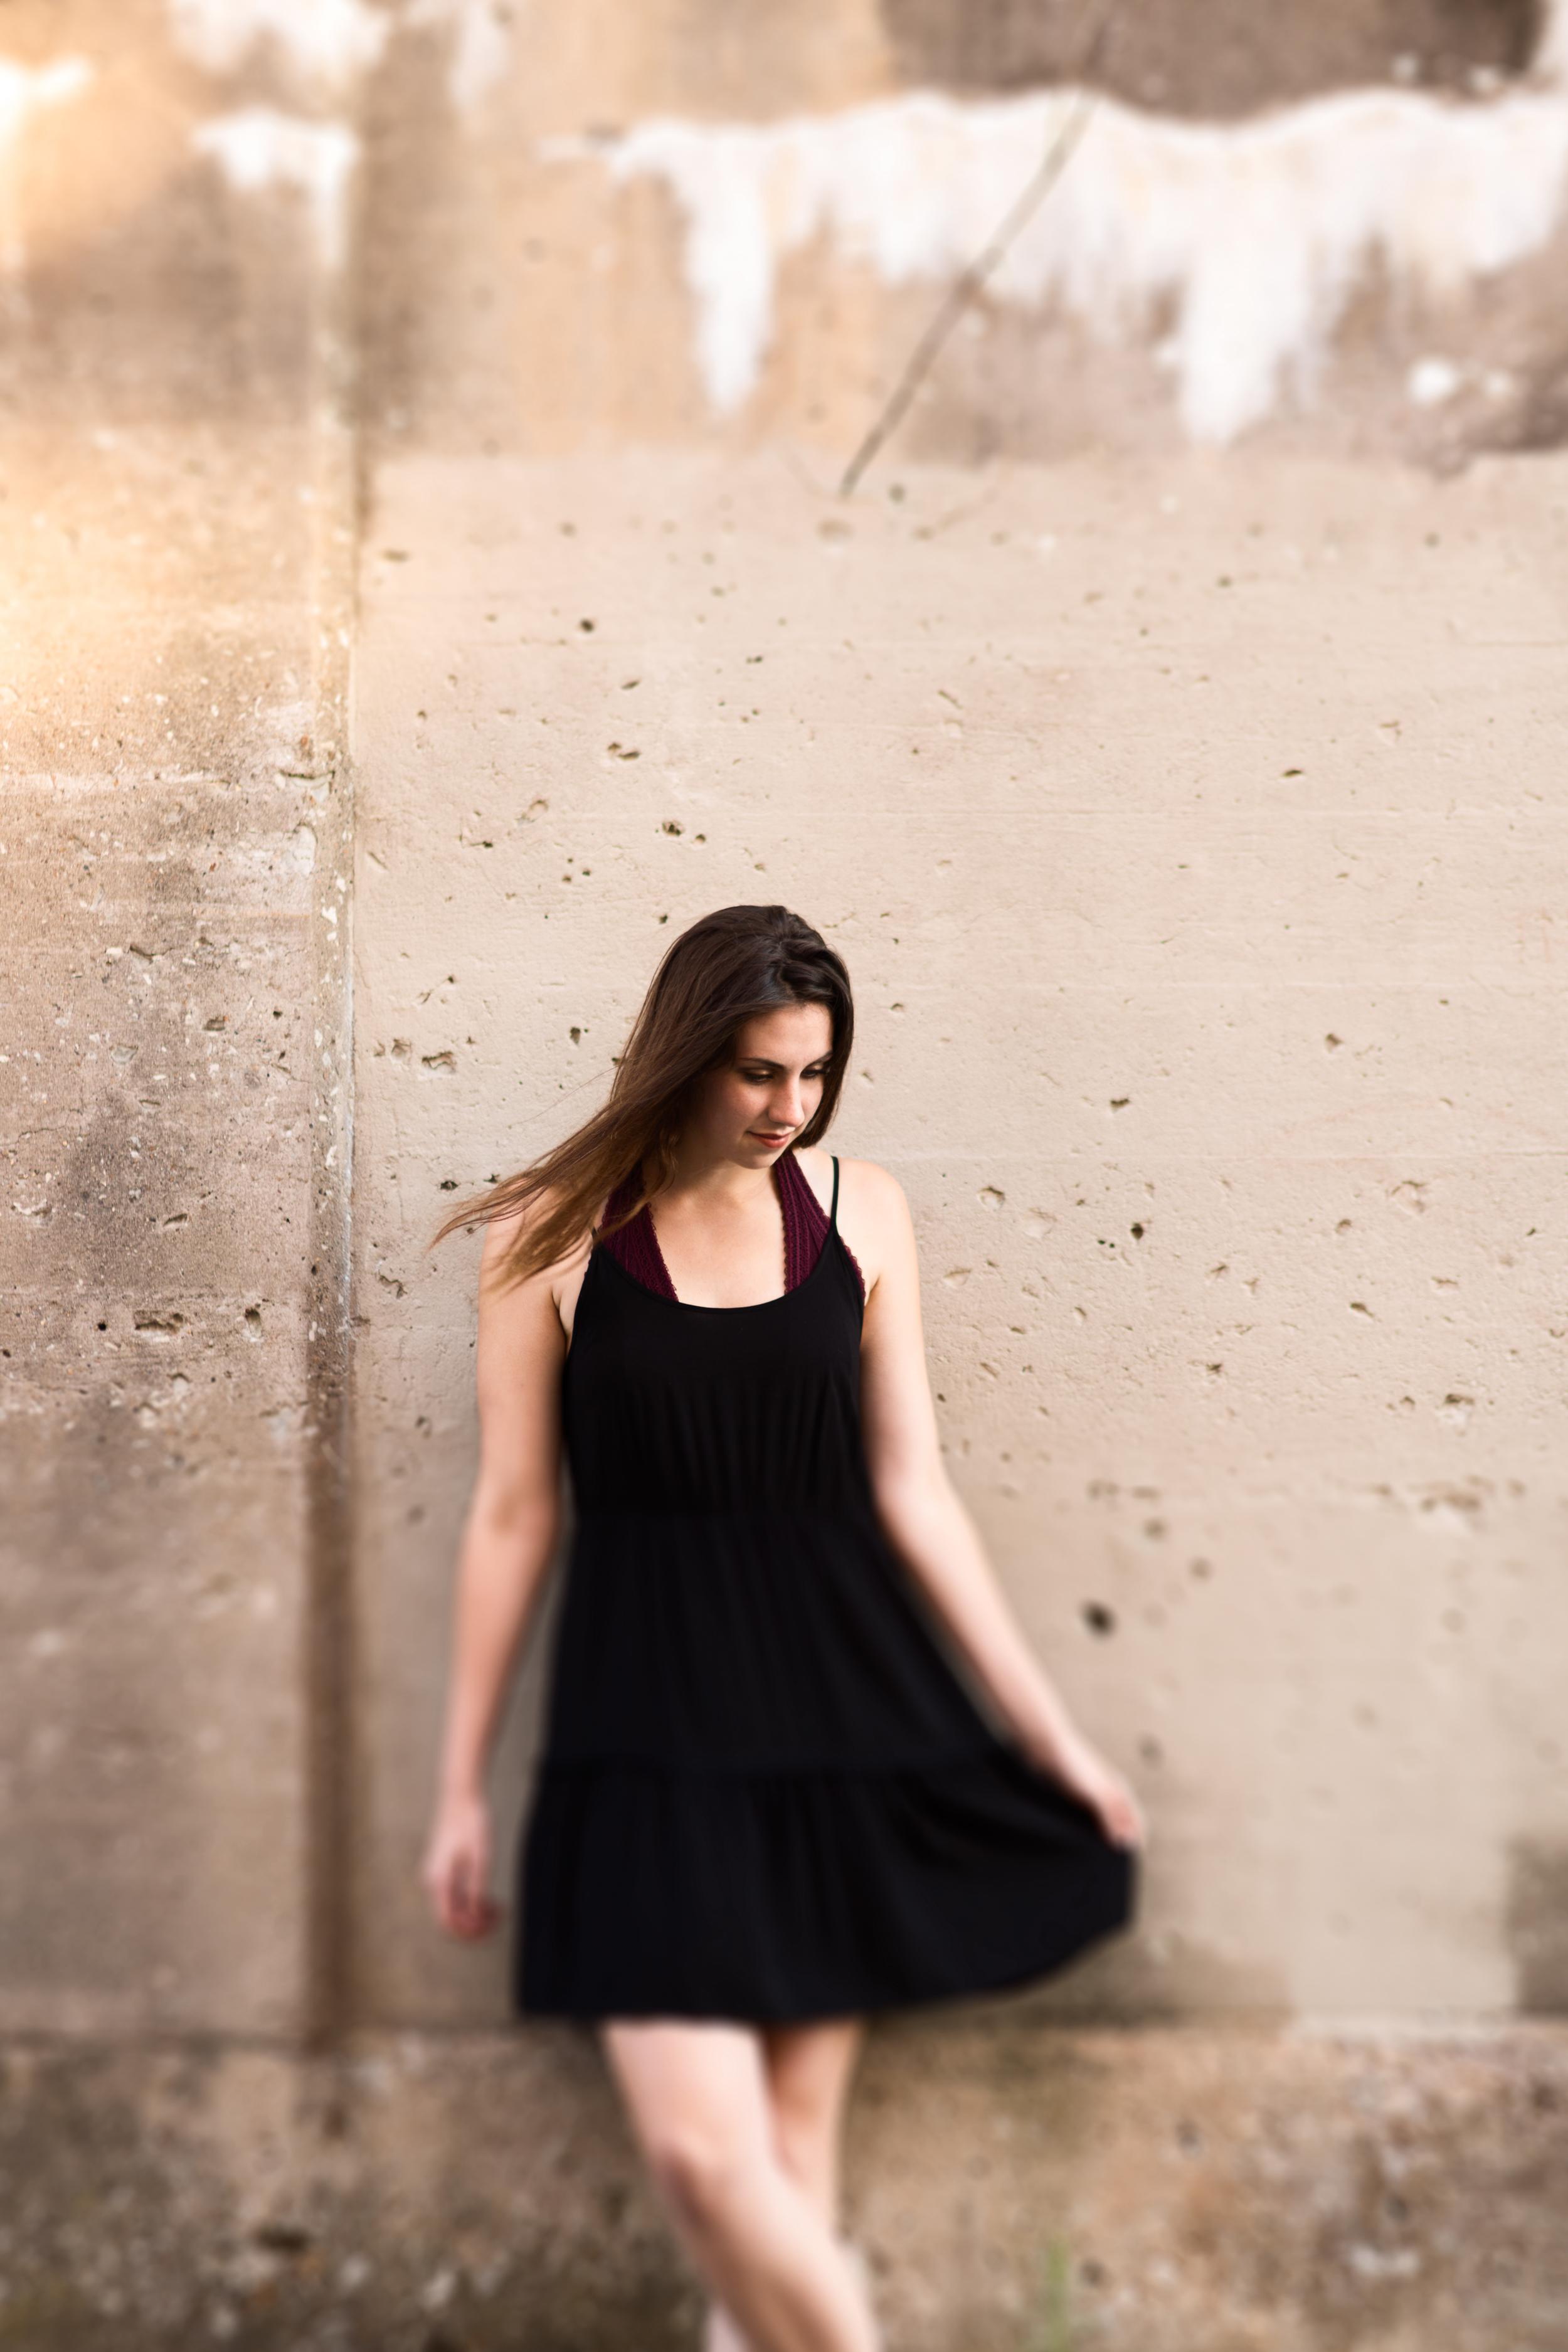 Addie - Senior Portraits - K. Stoddard Photography - Memphis, Tn Photographer - Phoenix, AZ Photographer - T